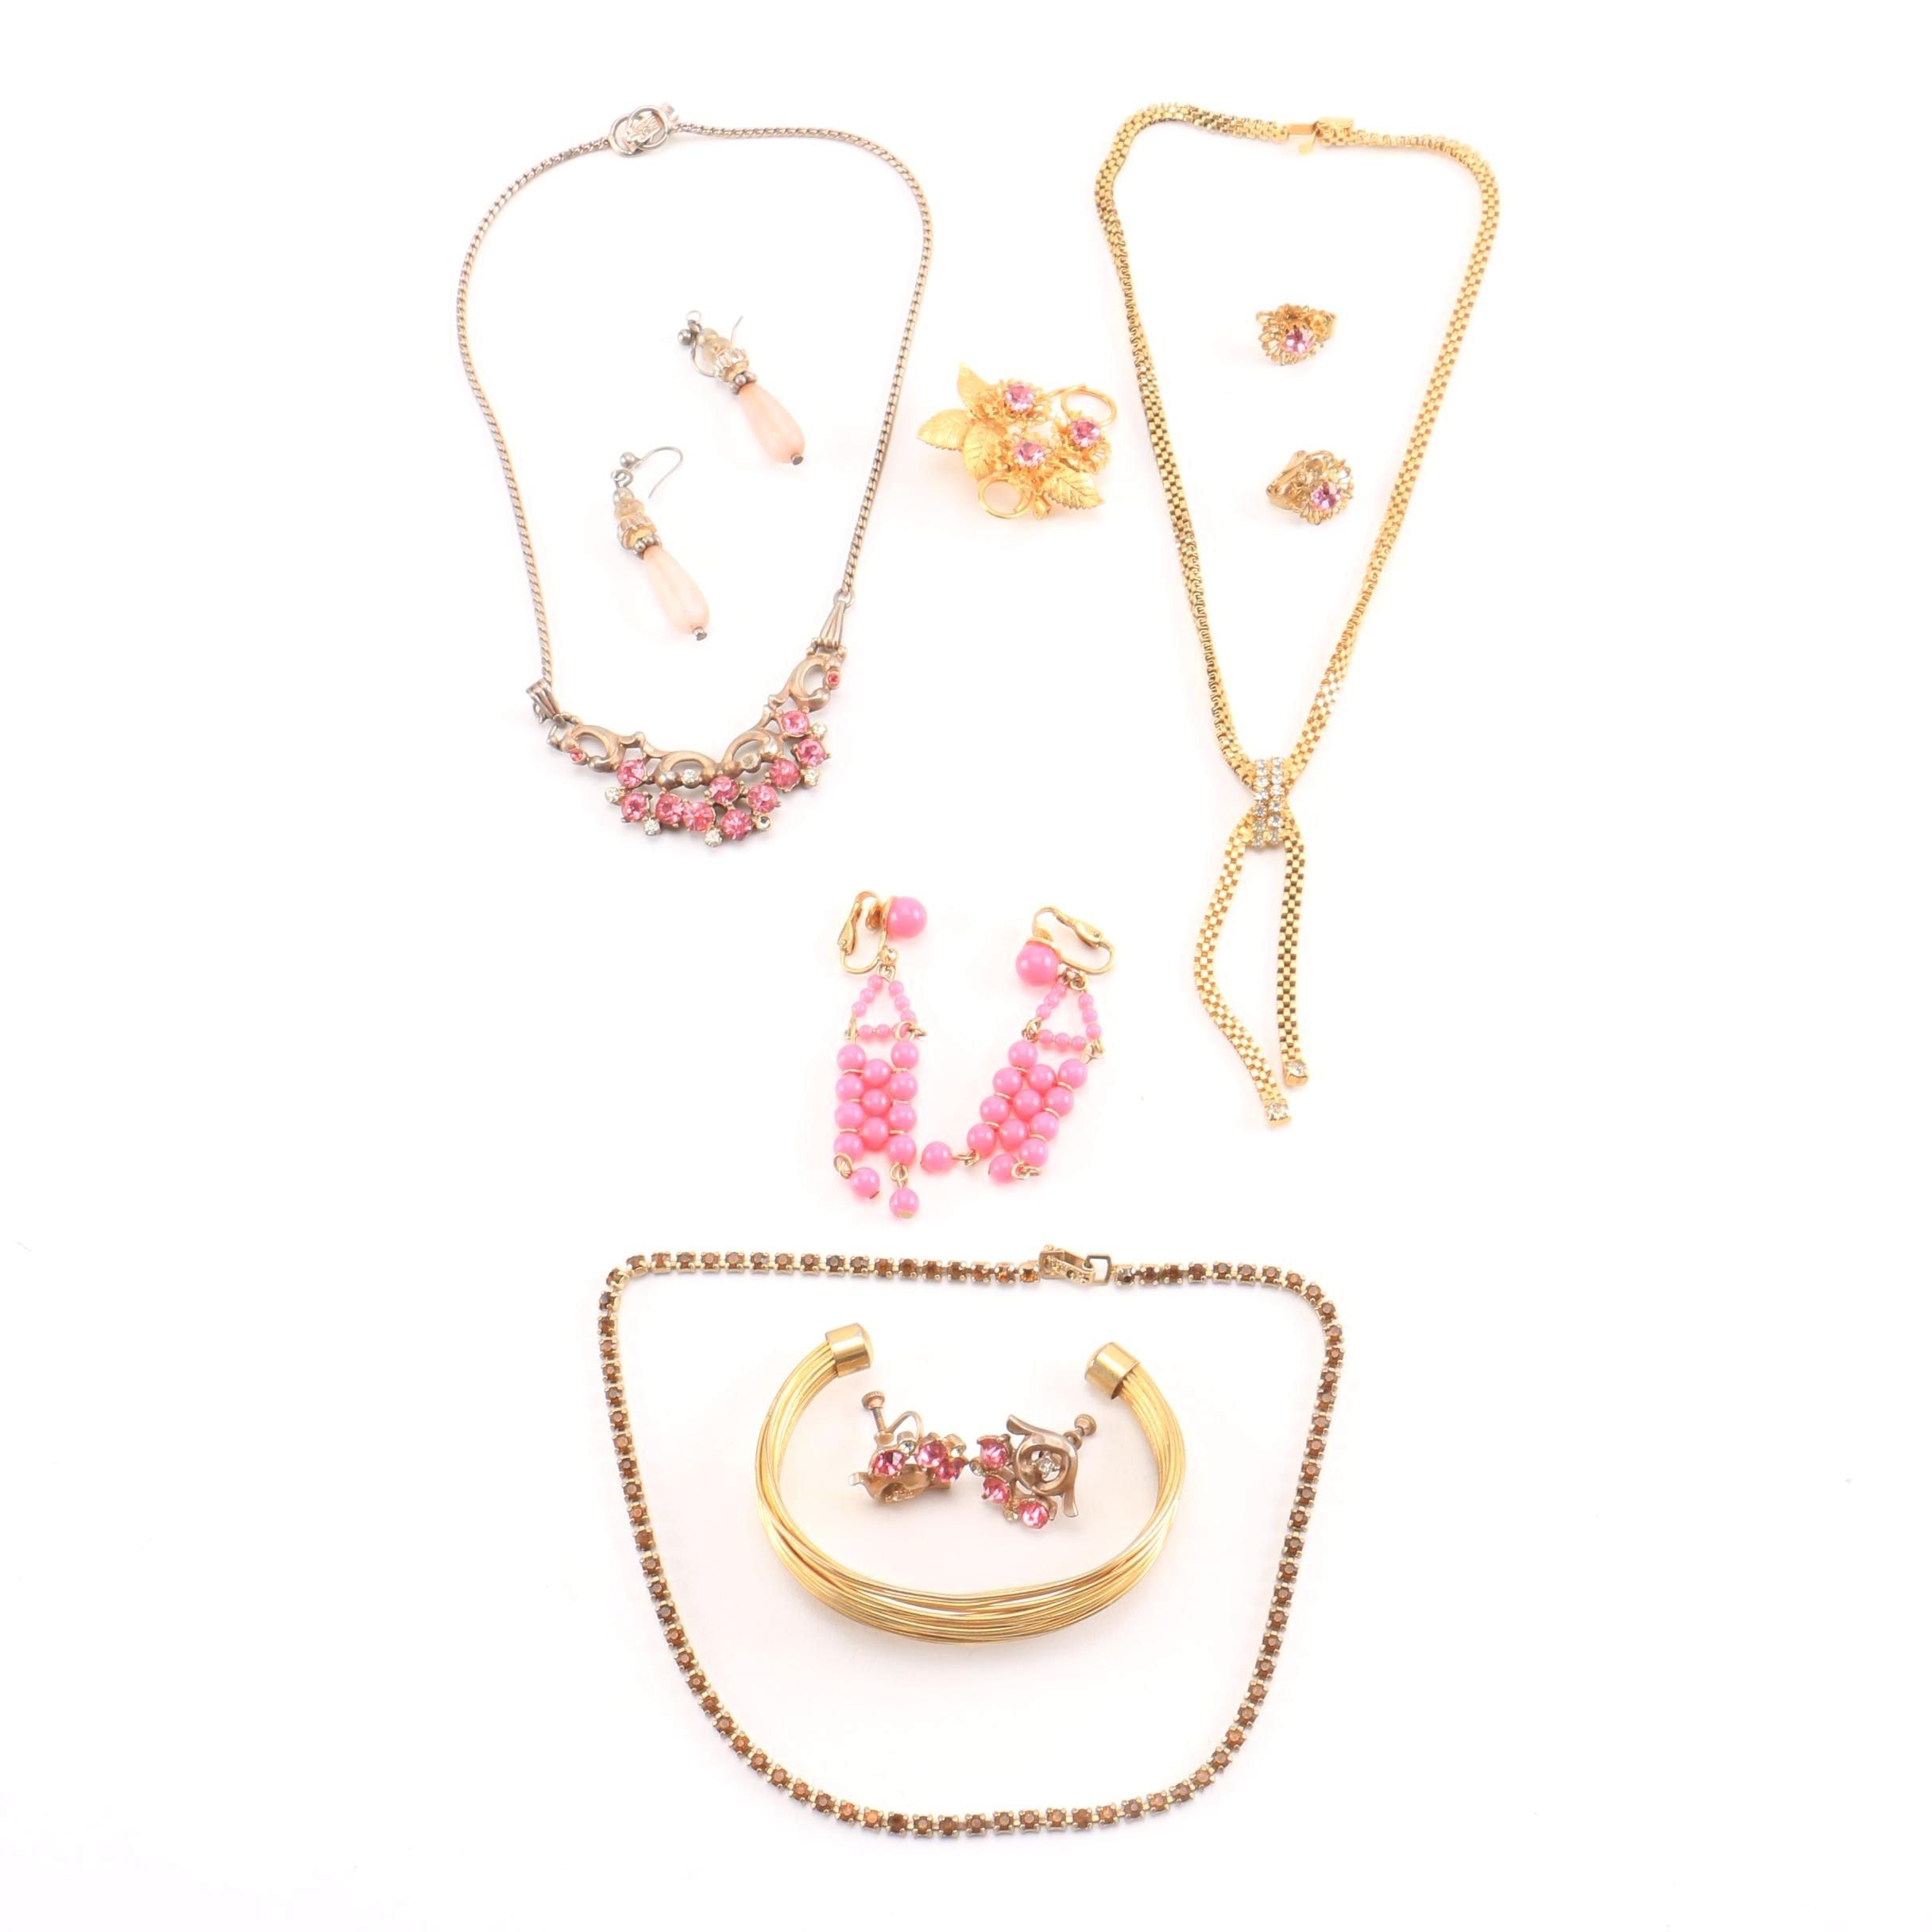 Vintage Gold Tone Rhinestone Jewelry